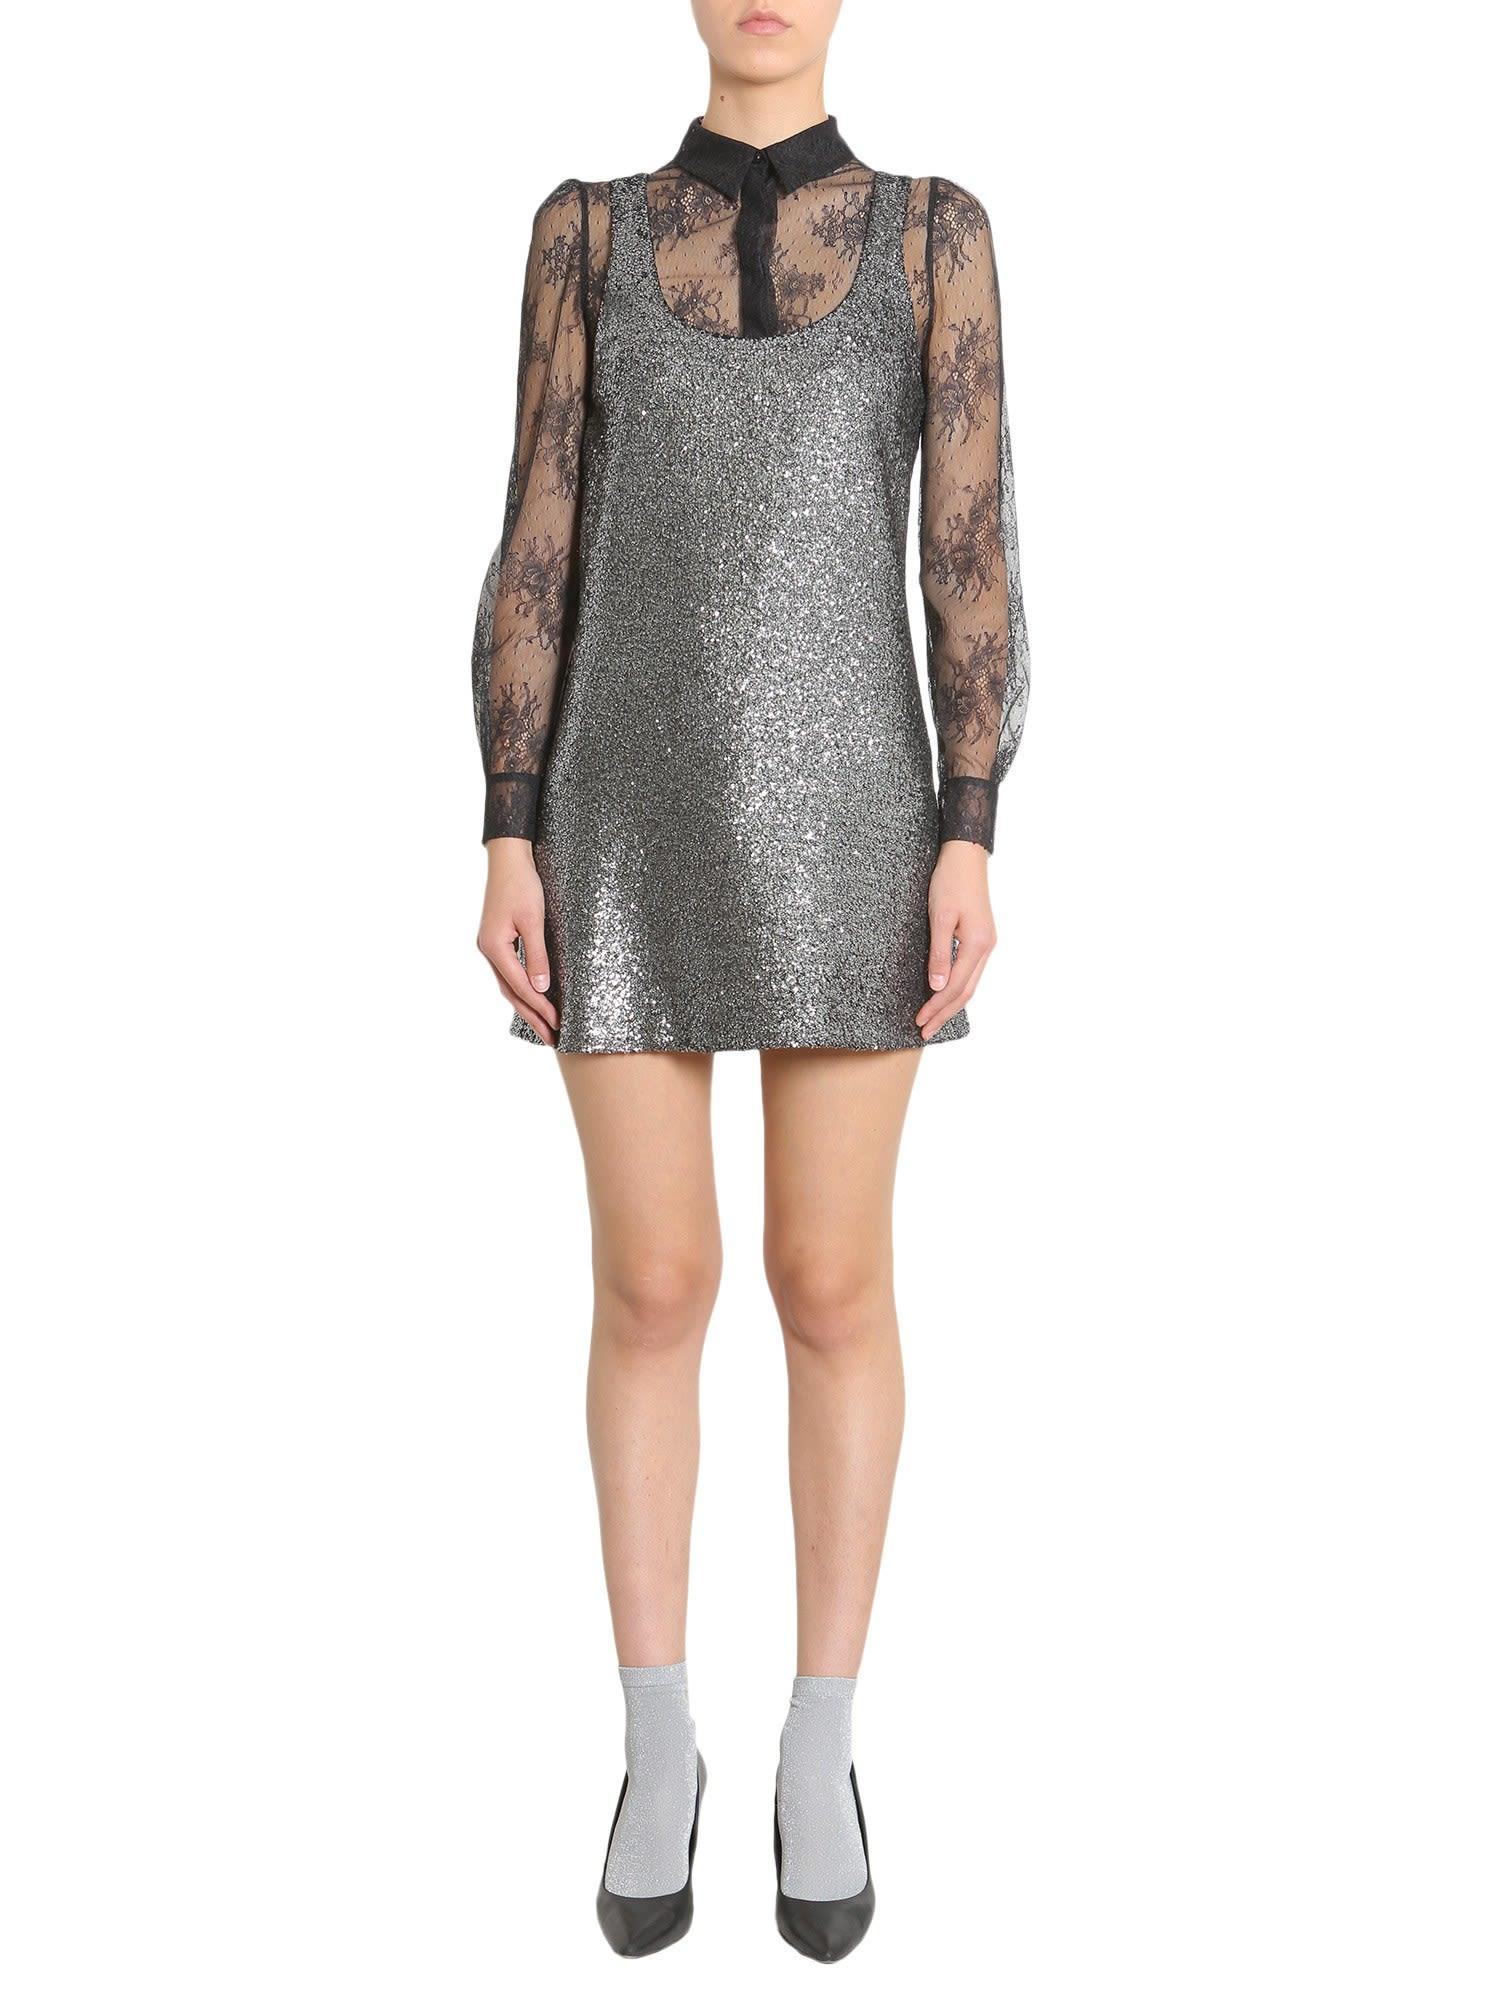 Boutique Moschino Metallic Boucle Dress